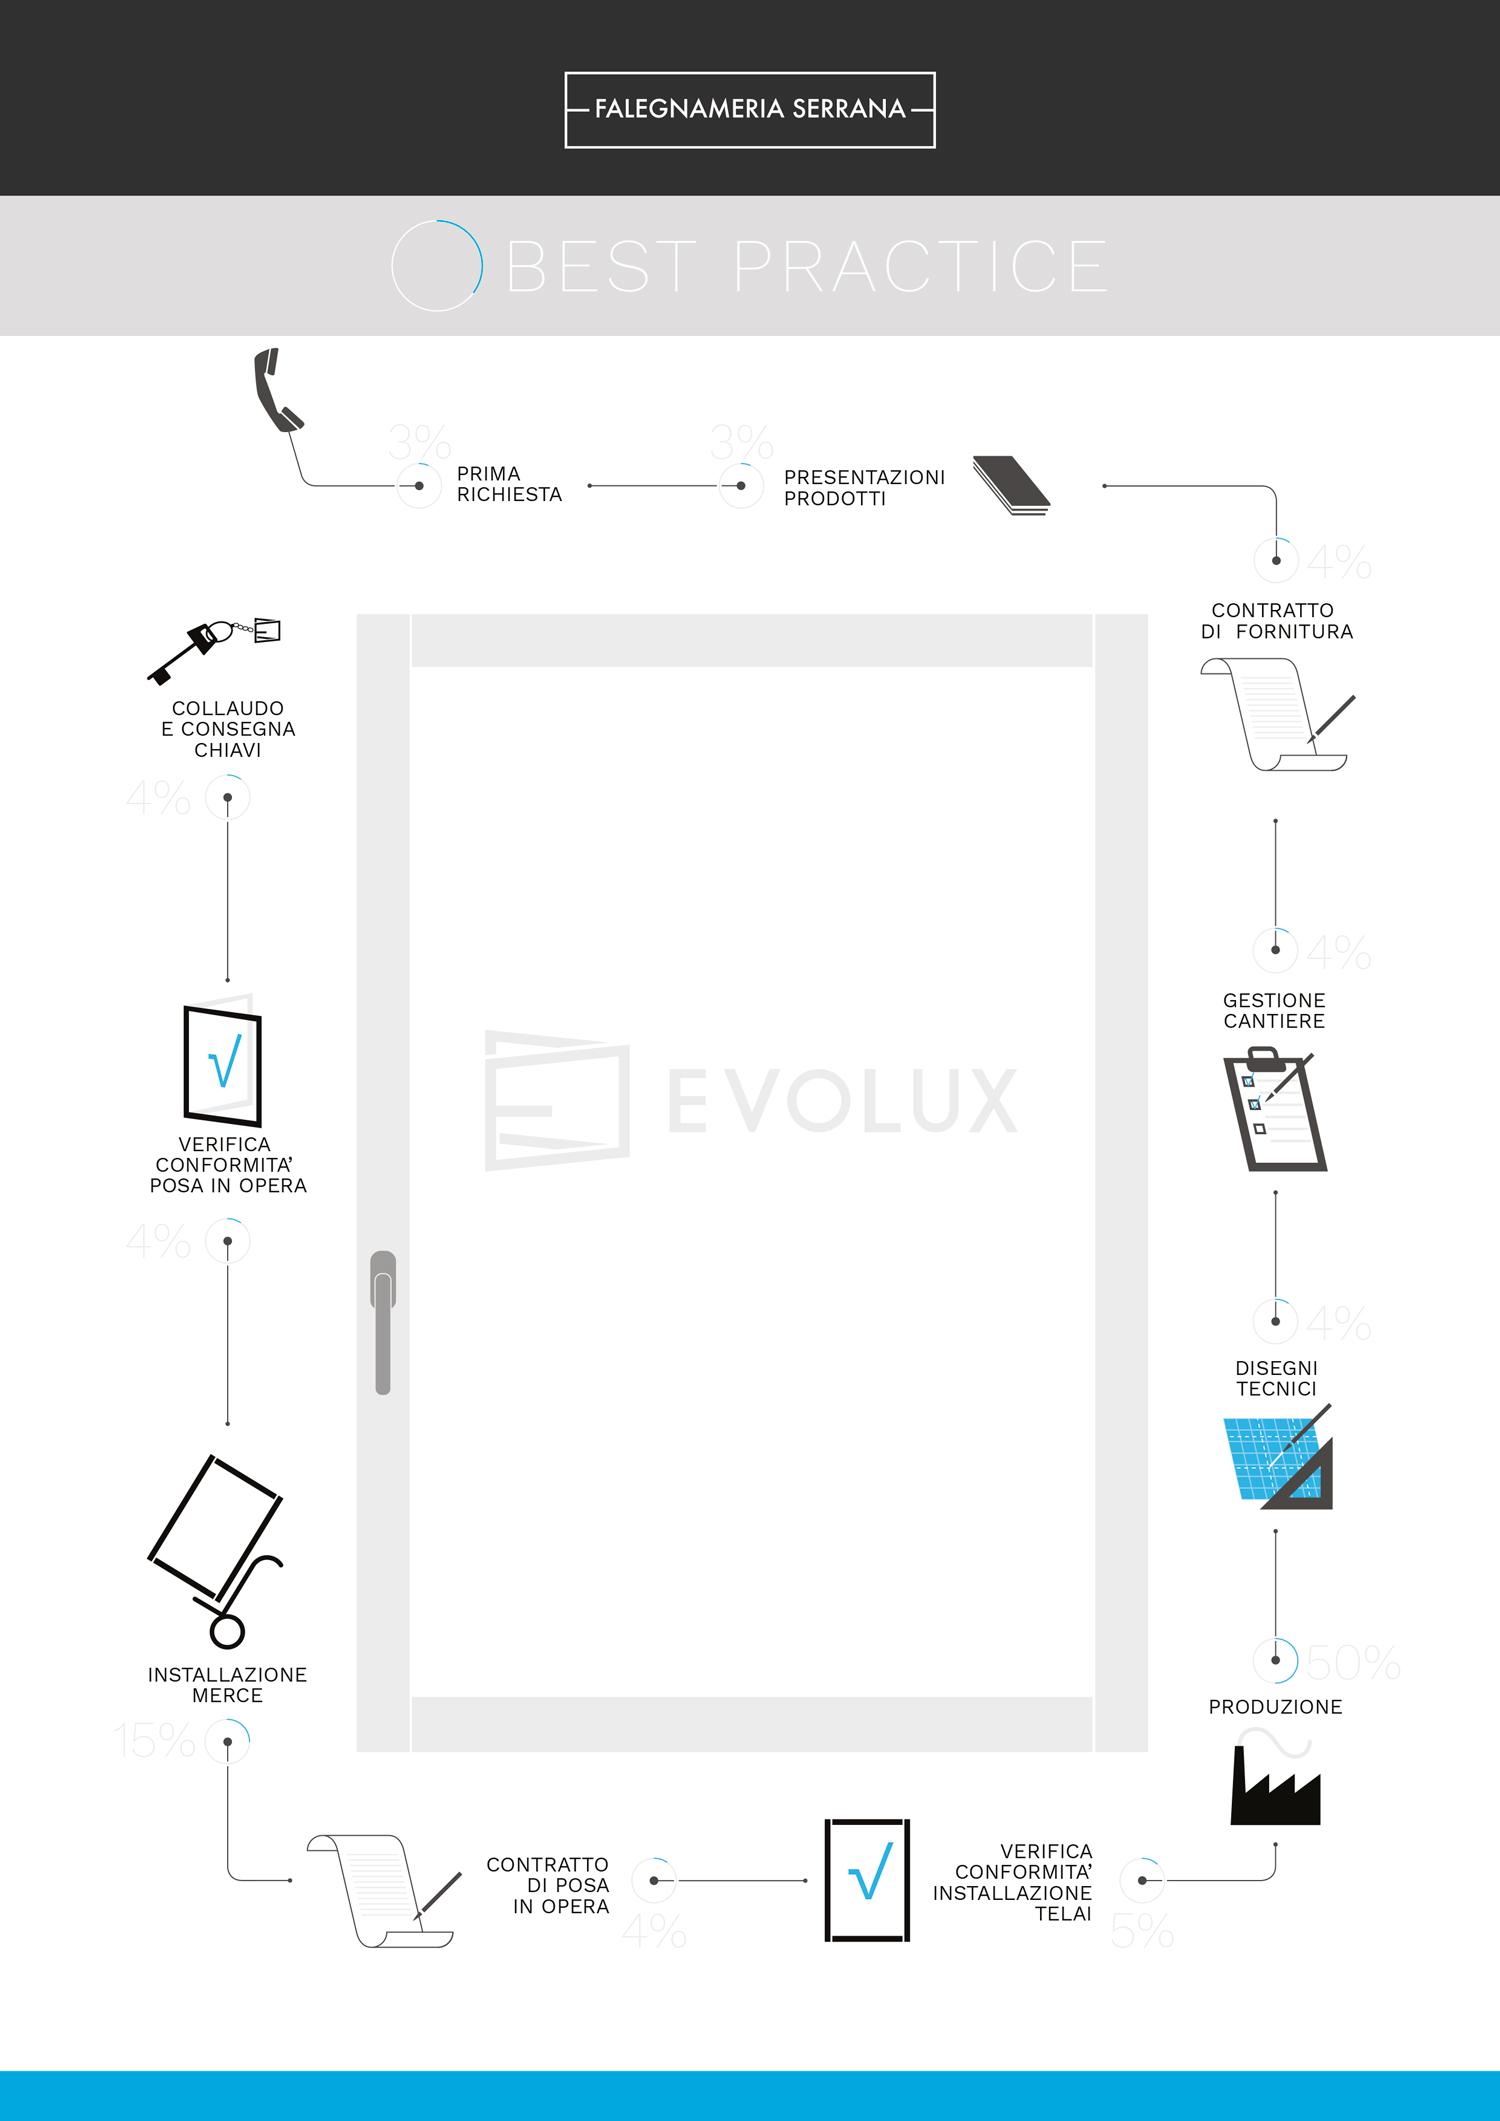 Infografica-FalSer-Best-Practice-1